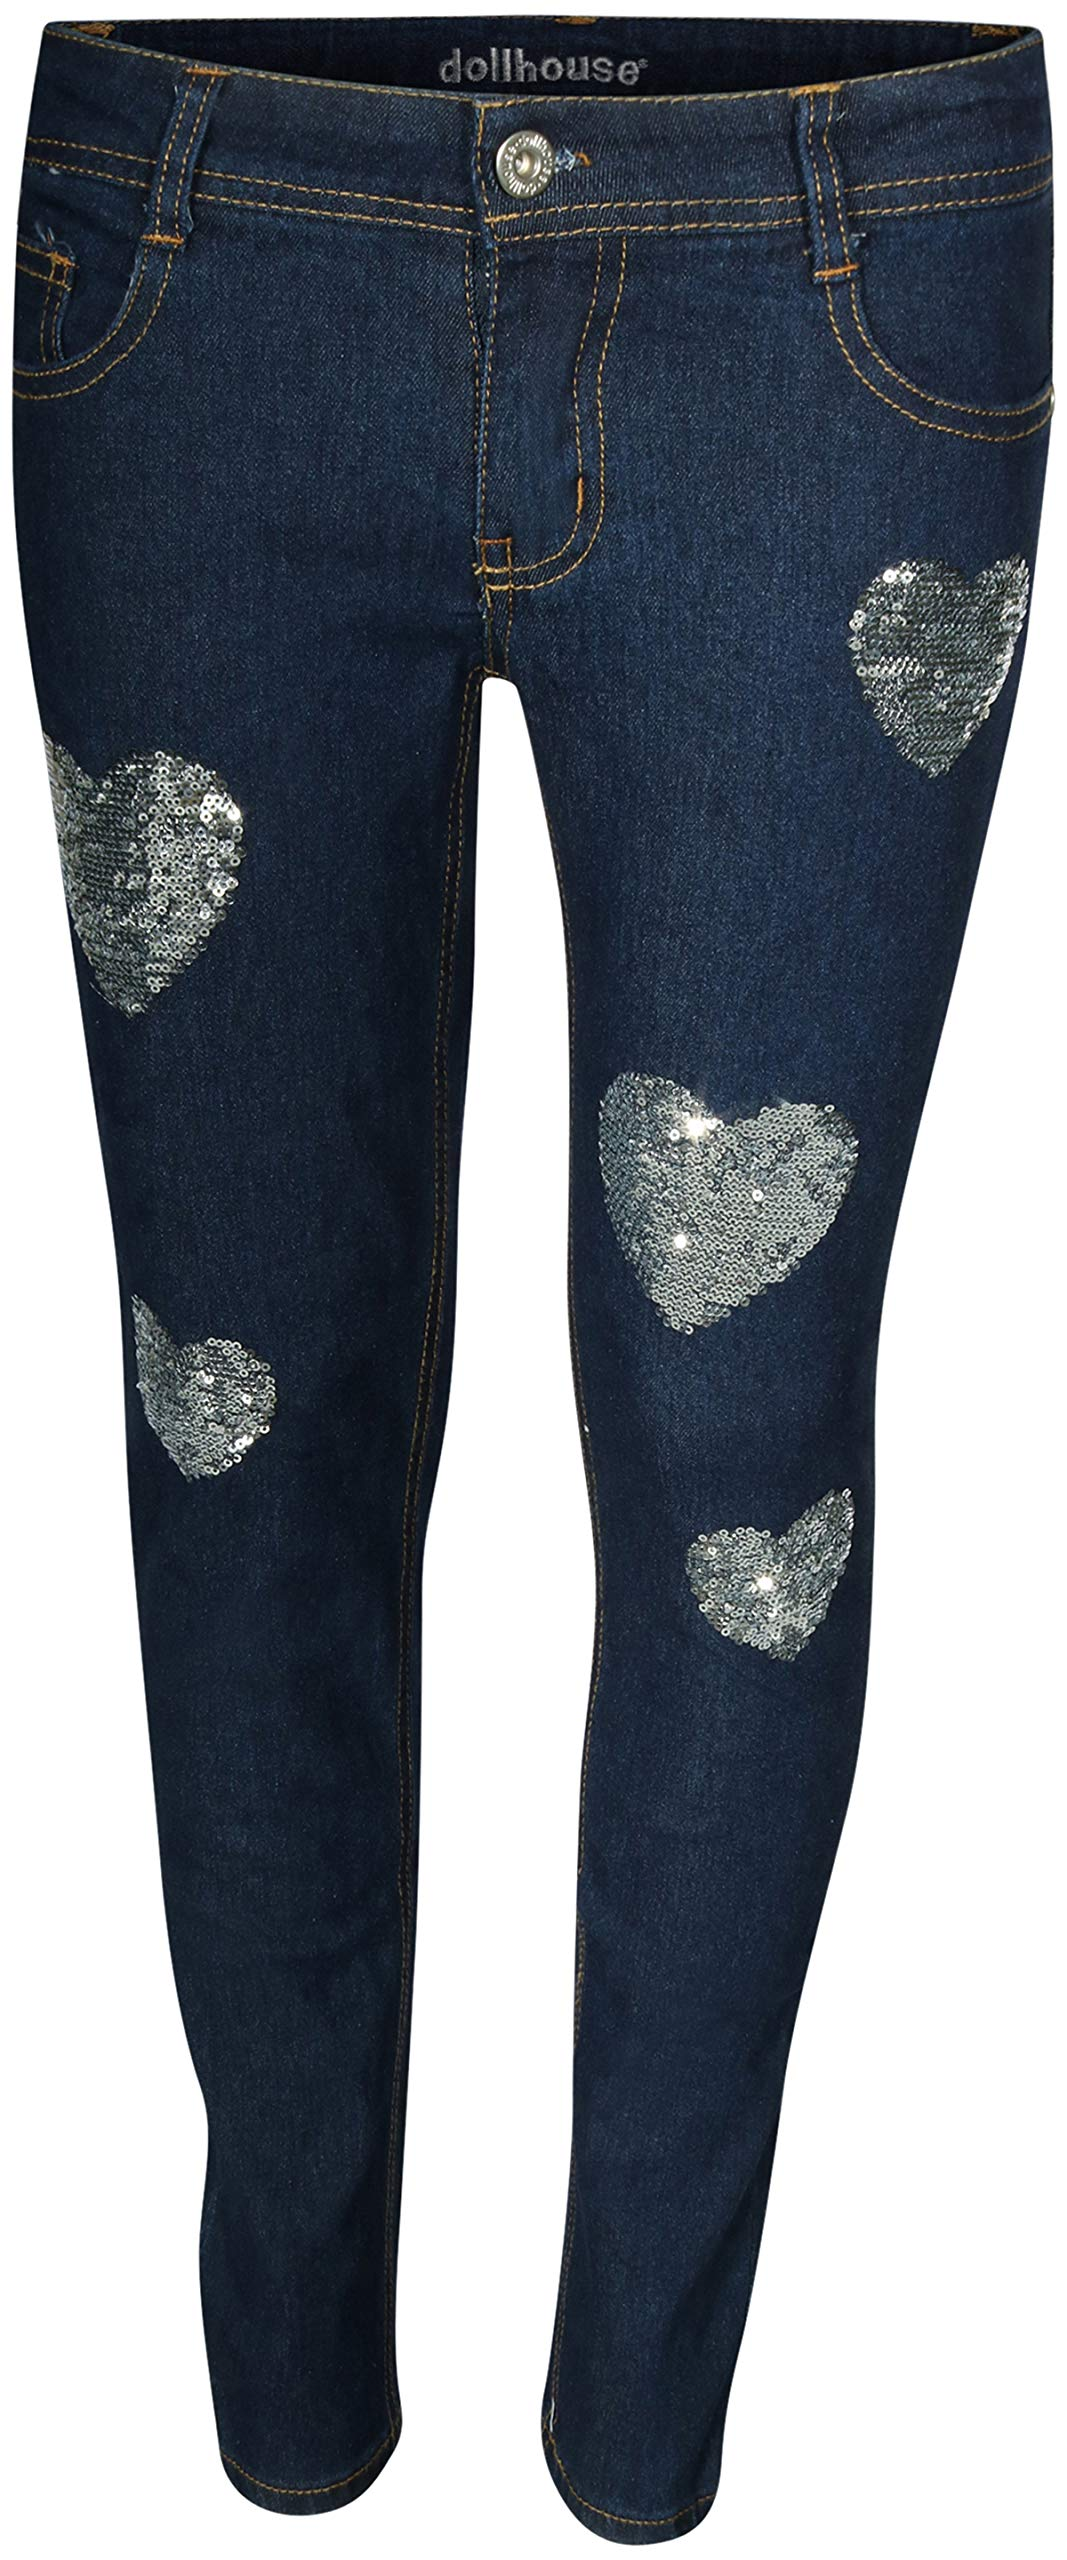 dollhouse Girl's Denim Skinny Jeans with Fashion Designs (Dark Hearts, 7)' by dollhouse